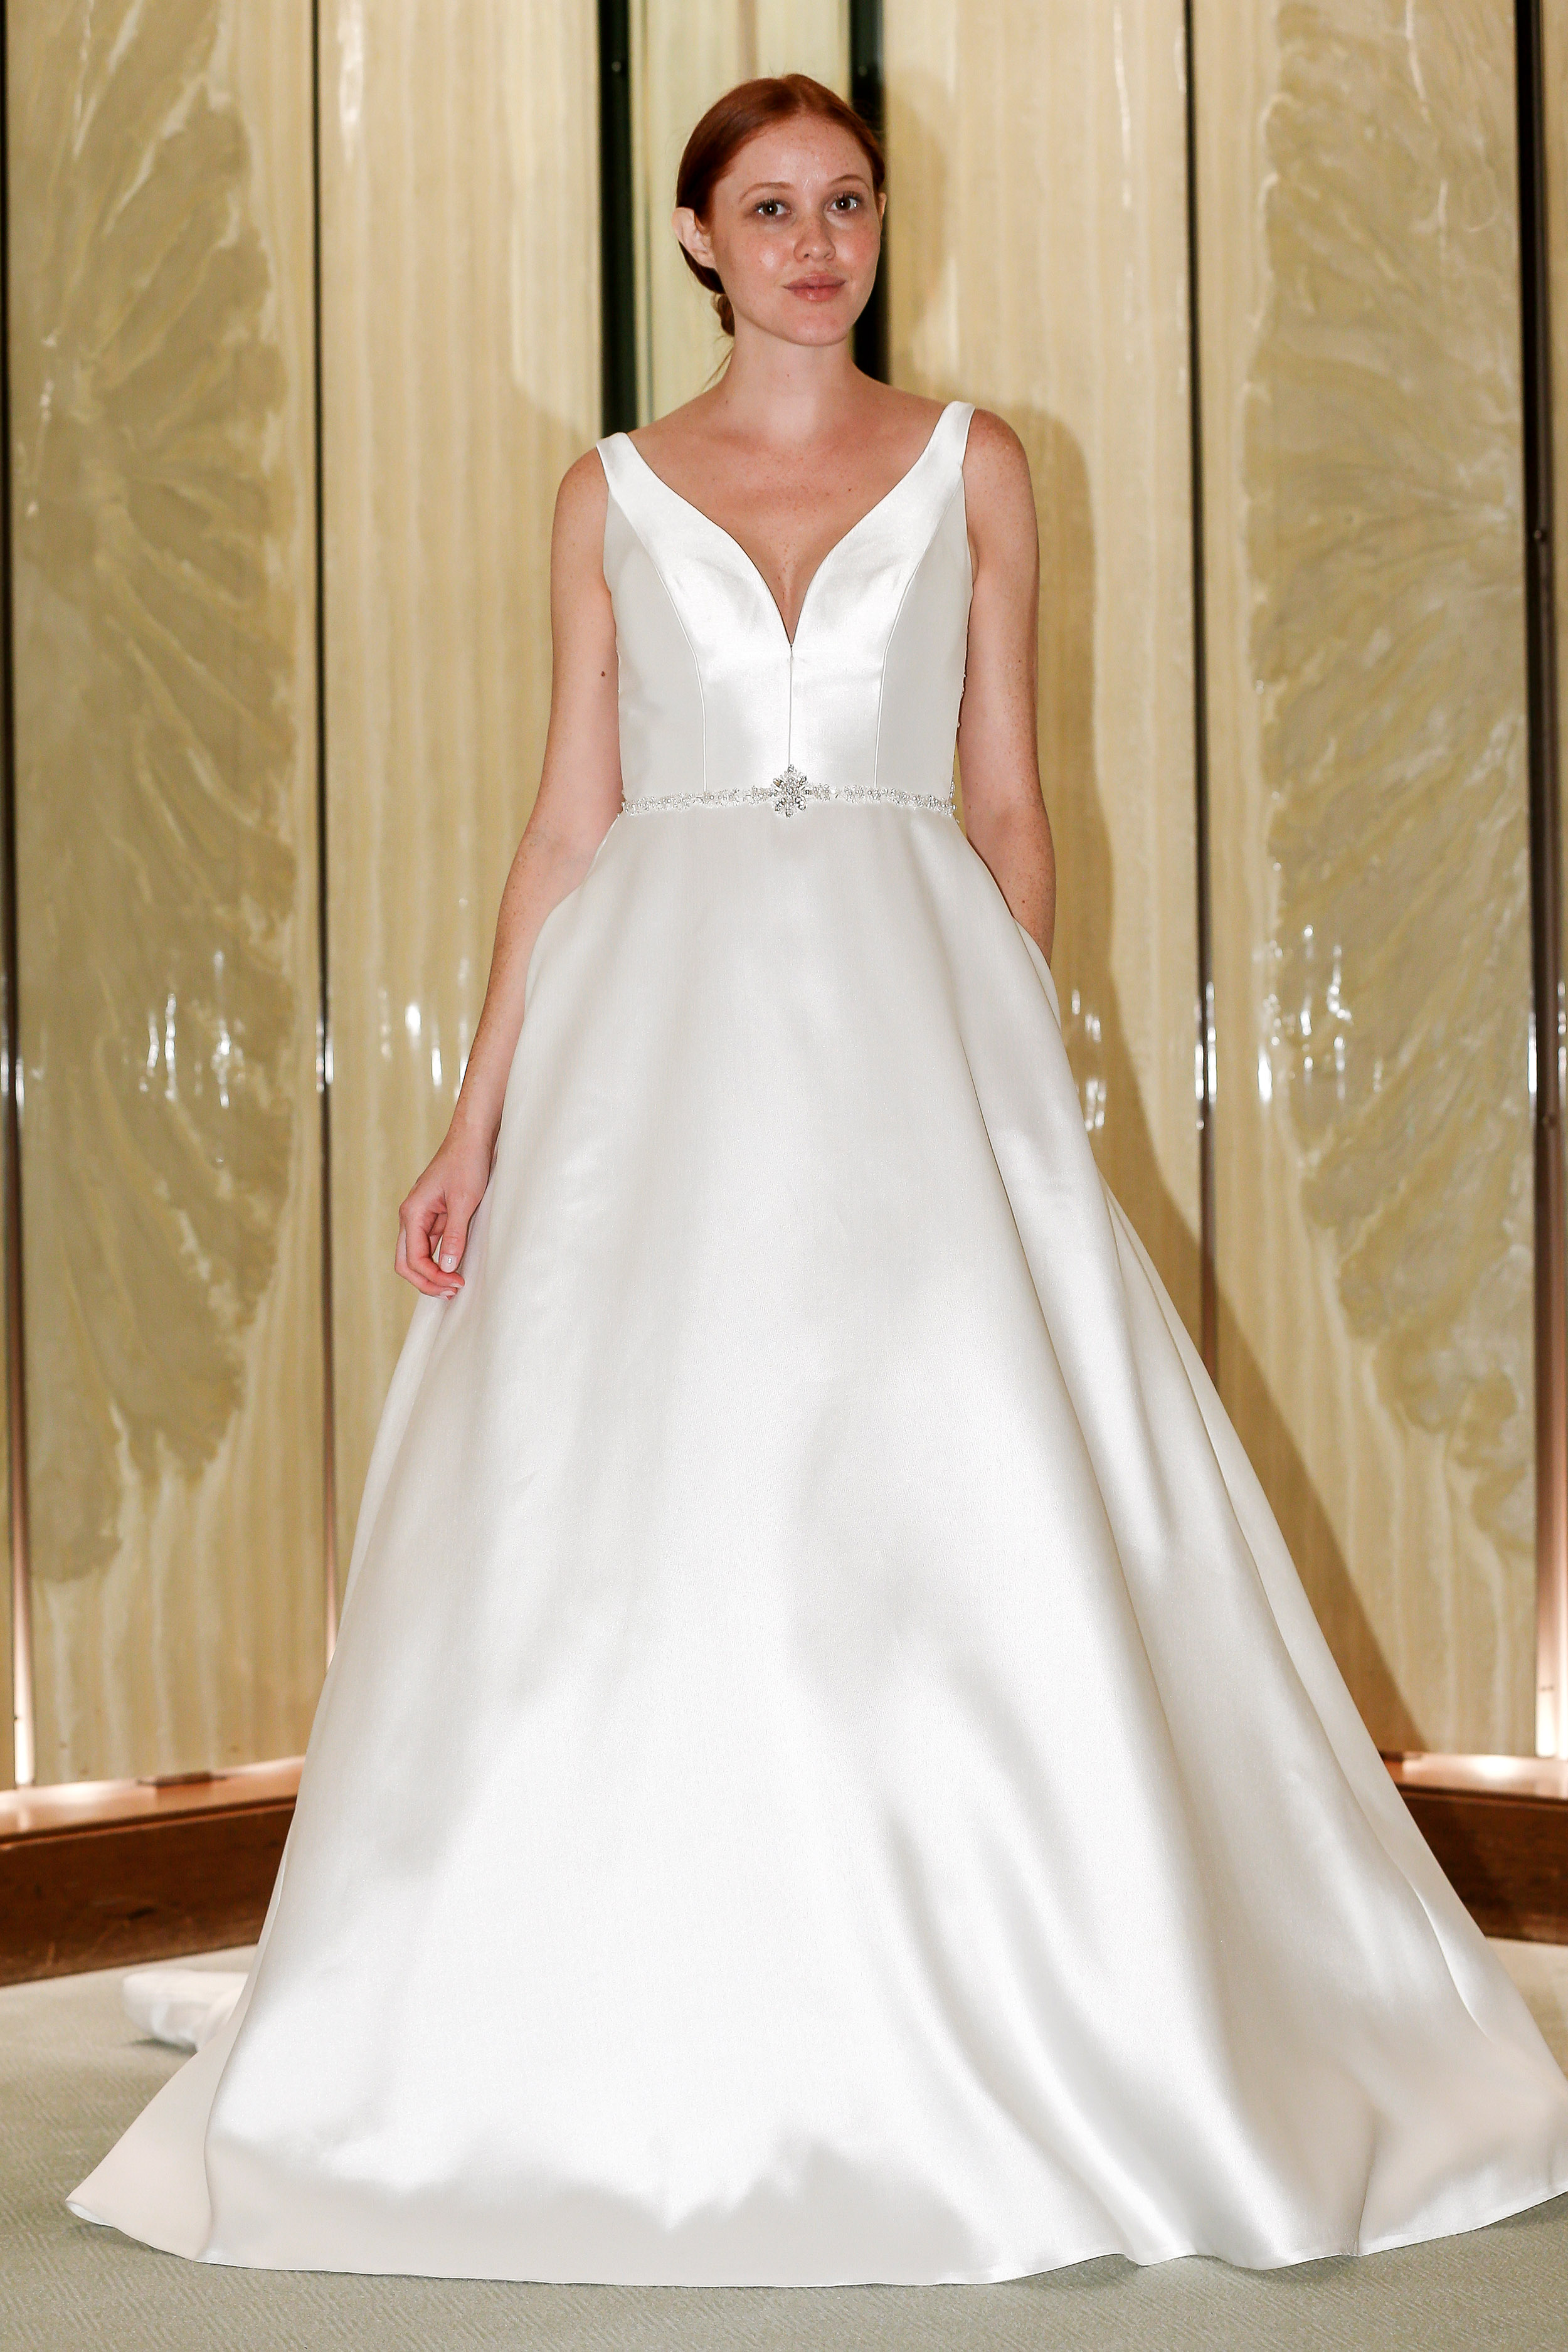 randy fenoli wedding dress satin v-neck a-line